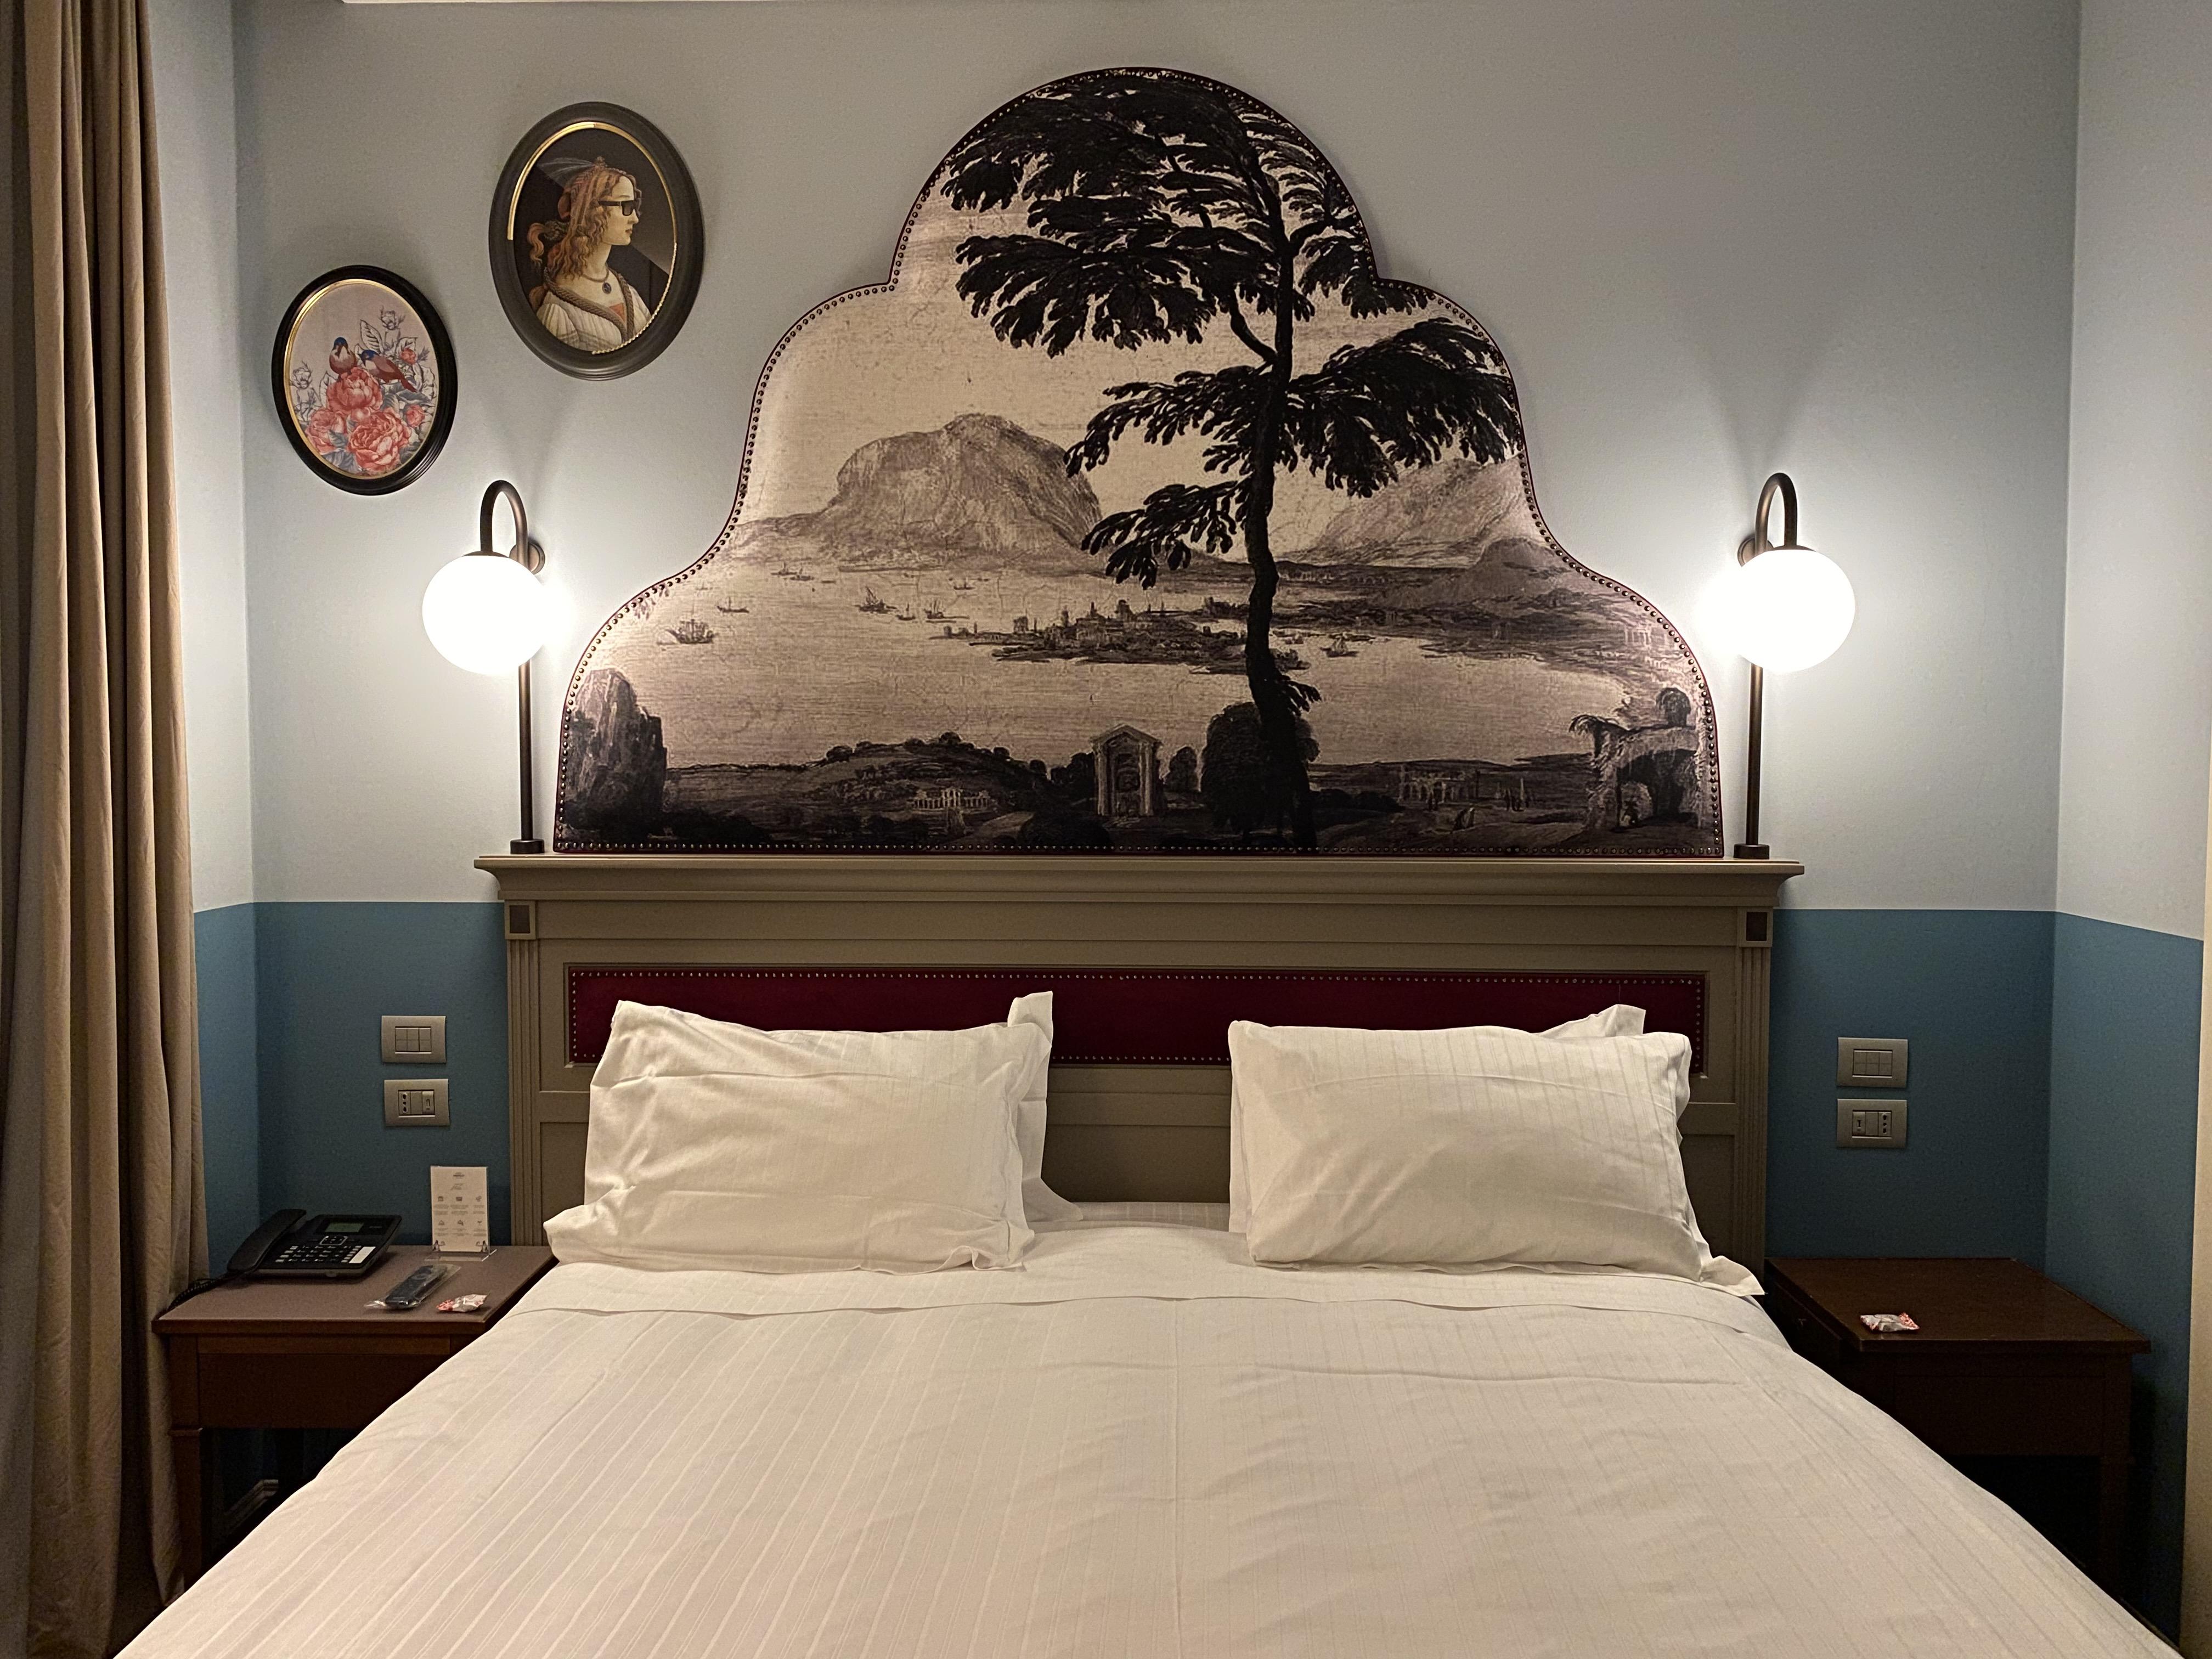 Review – Hotel Indigo Verona Grand Hotel Des Arts